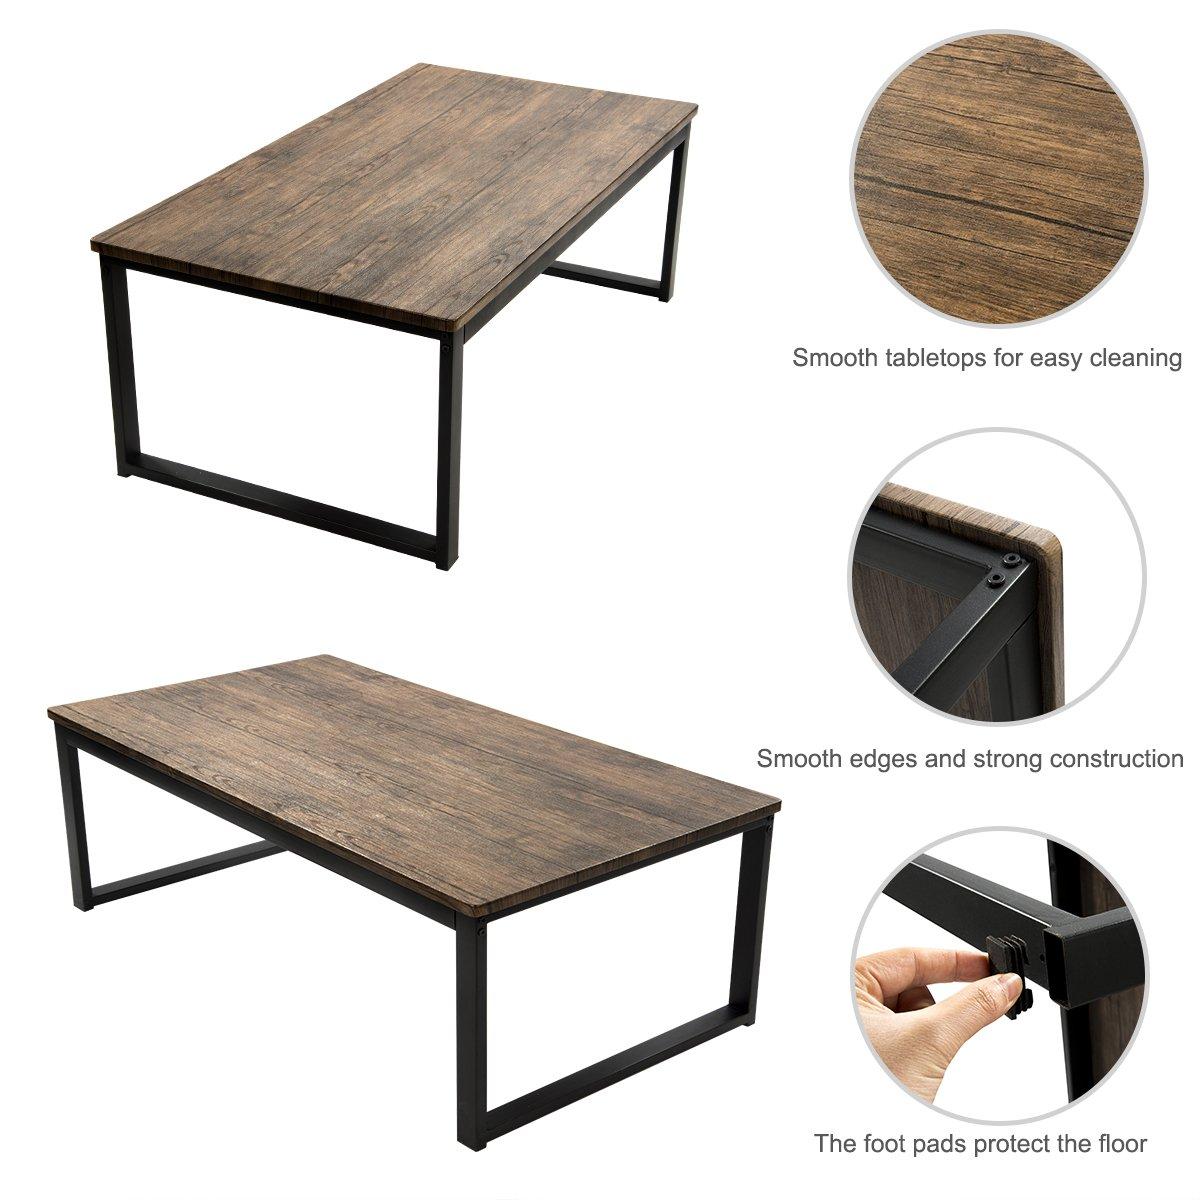 Aingoo Rustic Coffee Table Large Sofa Table Mid-Century Rectangle Metal Frame Dark Brown 43″ Wooden Grain CT-01 …